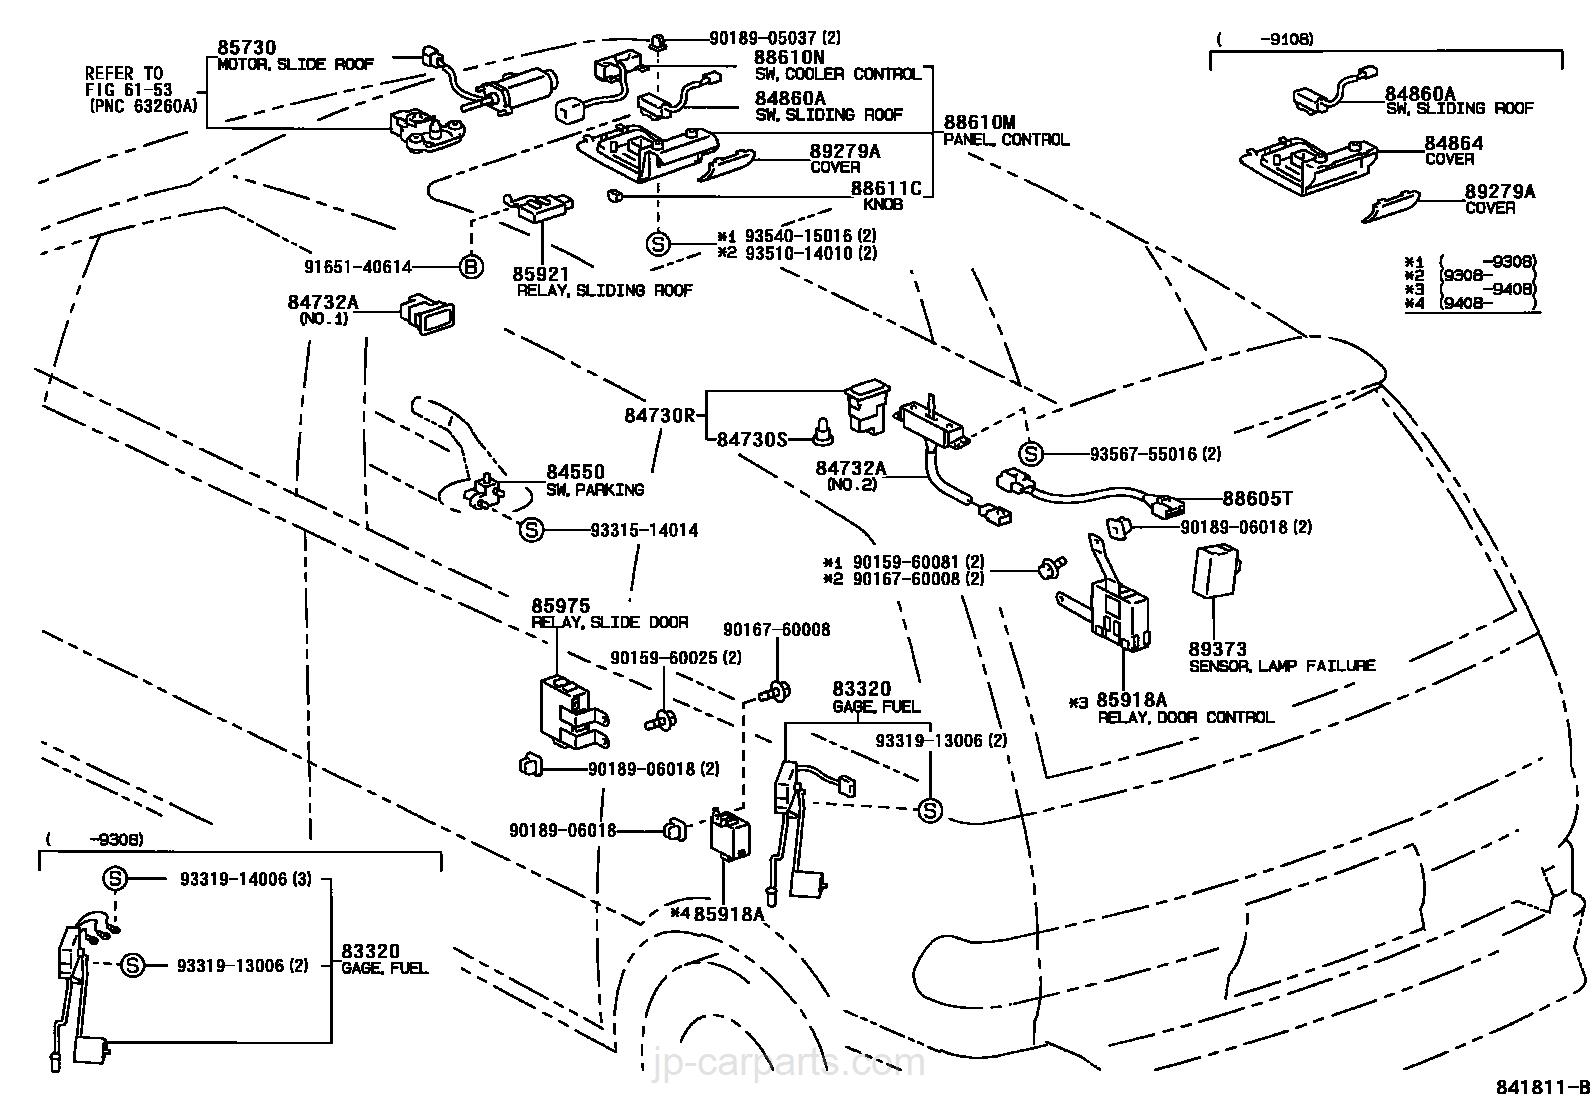 hight resolution of wiring diagram toyota estima 41 alphatrend co u2022wiring diagram toyota estima images gallery toyotum granvium